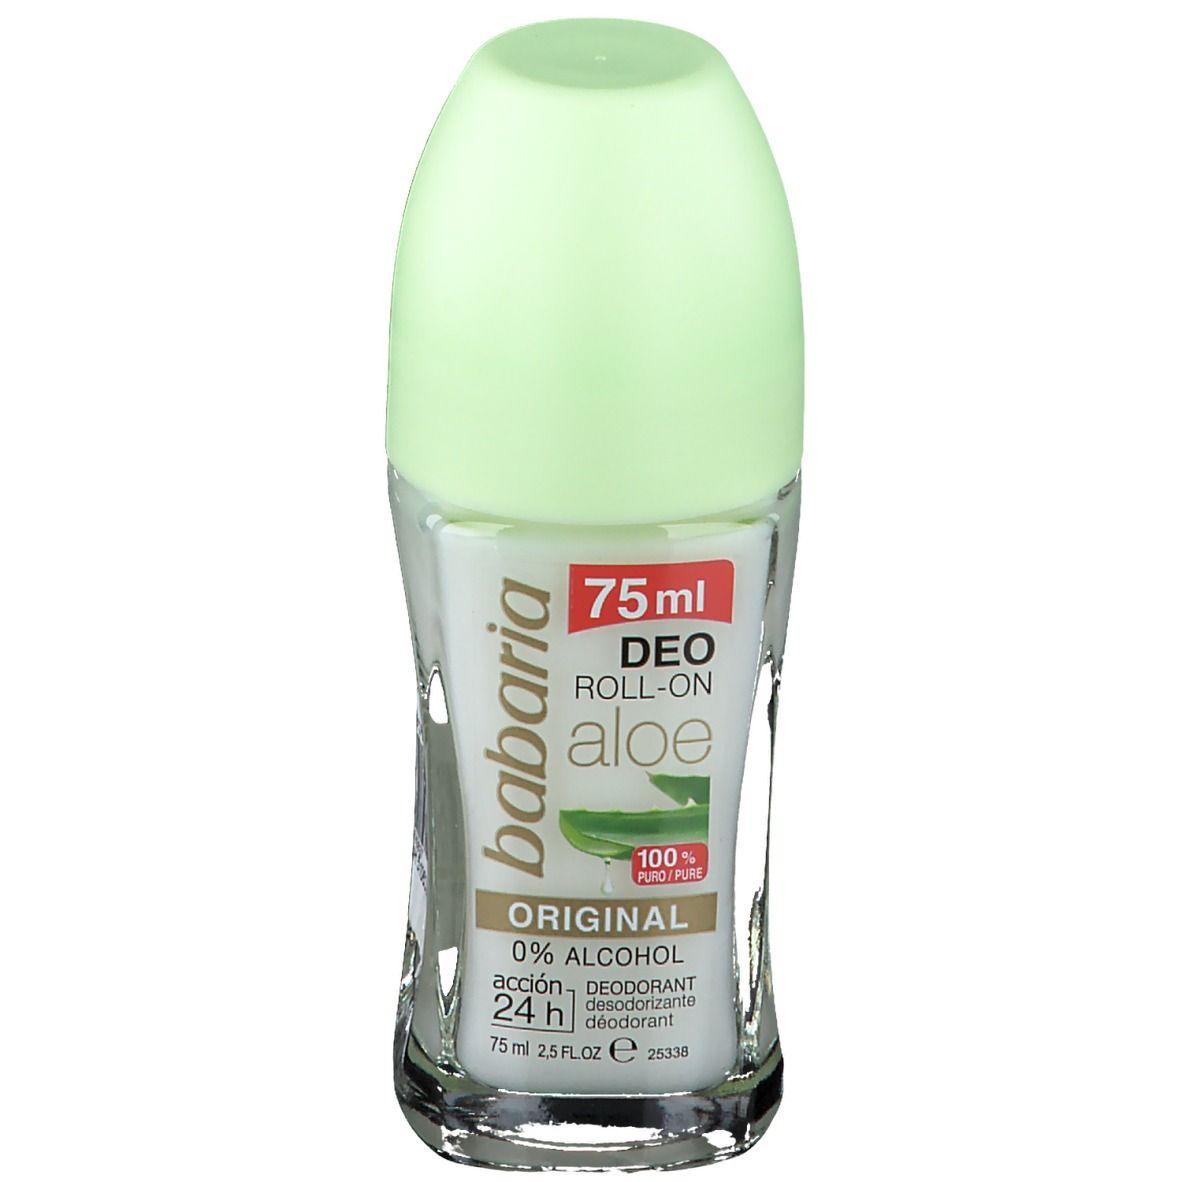 Image of babaria Aloe Vera Roll-On Deodorant